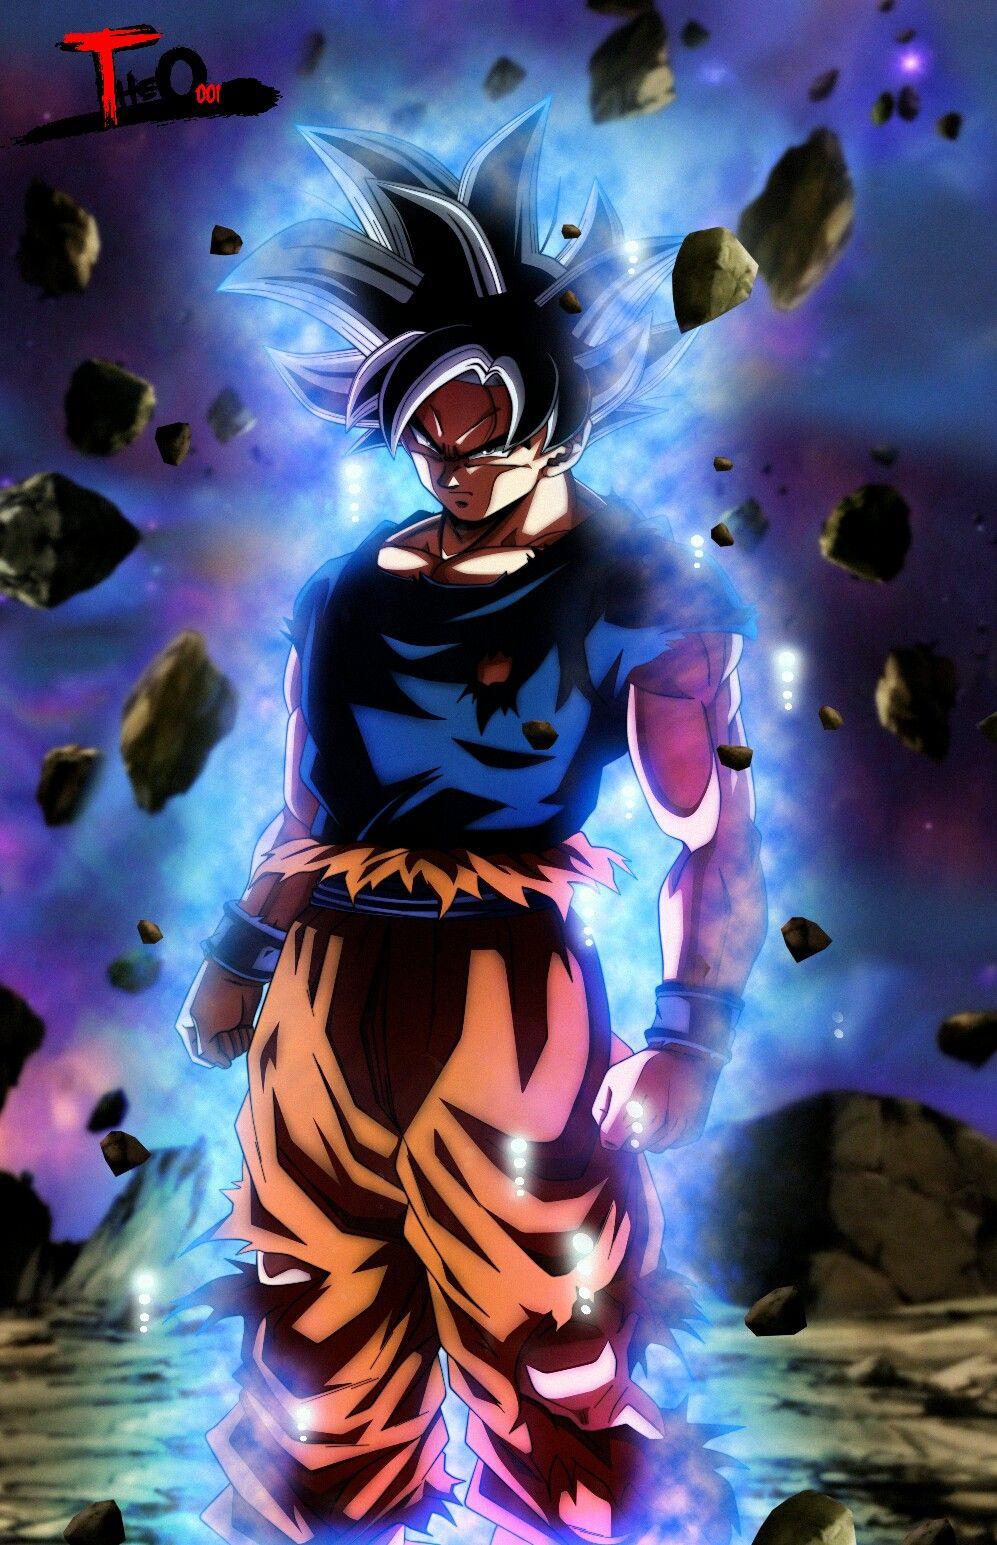 Goku ultra instinto universo 7 dragon ball goku dragon ball son goku - Imagenes de dragon ball super ultra instinto ...